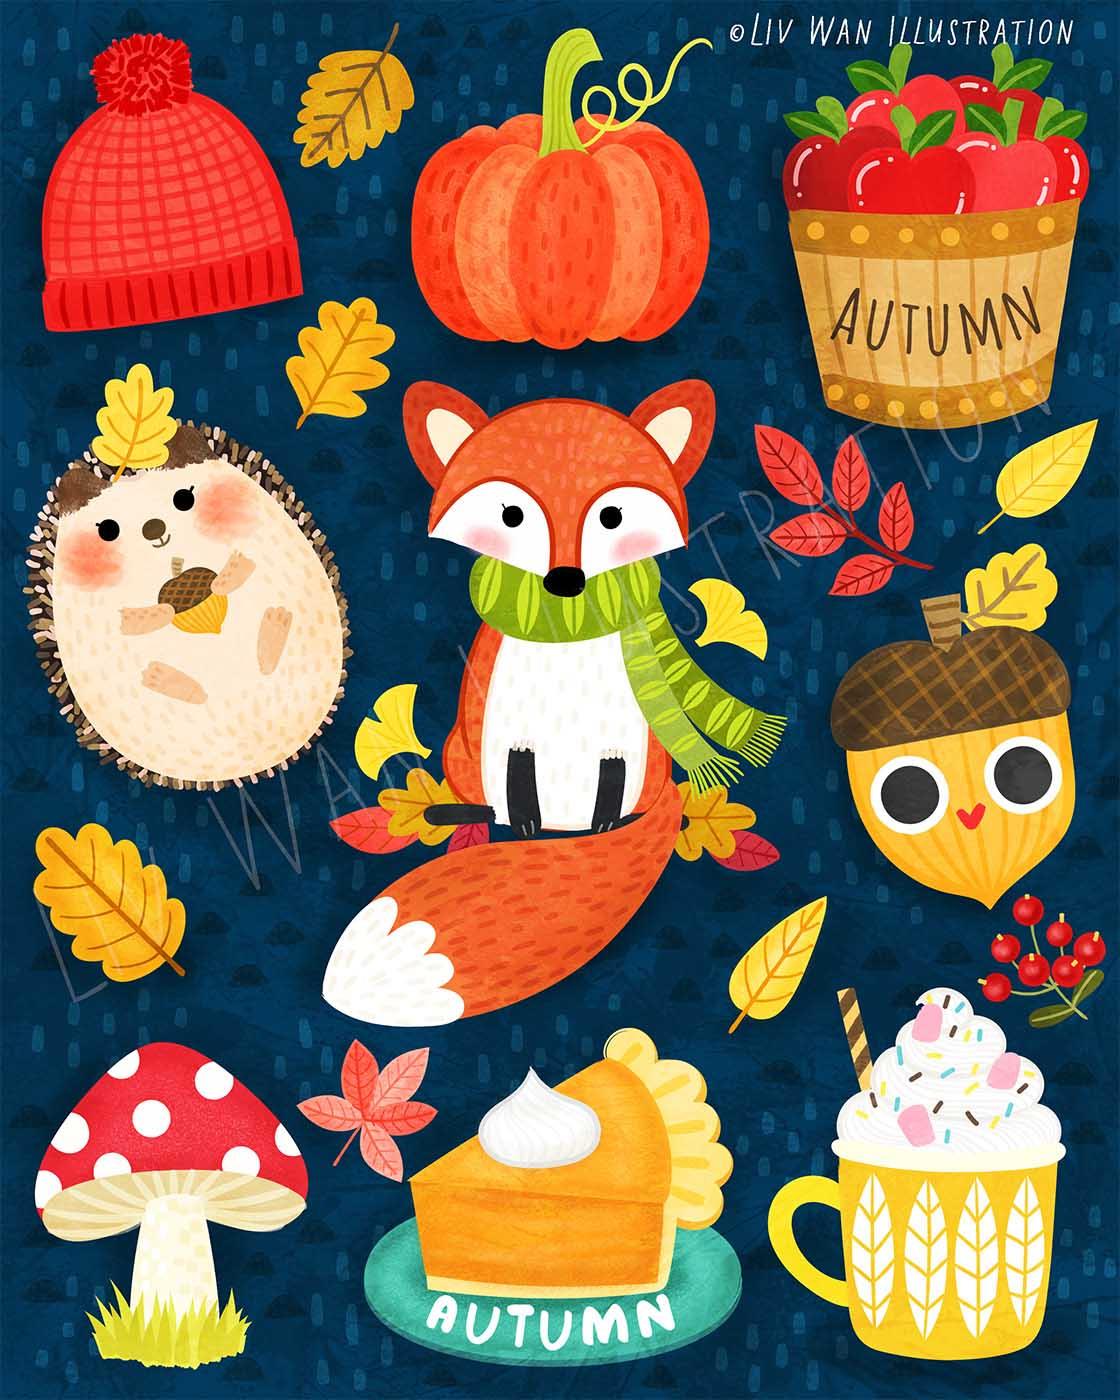 snapchat autumn sticker illustrations